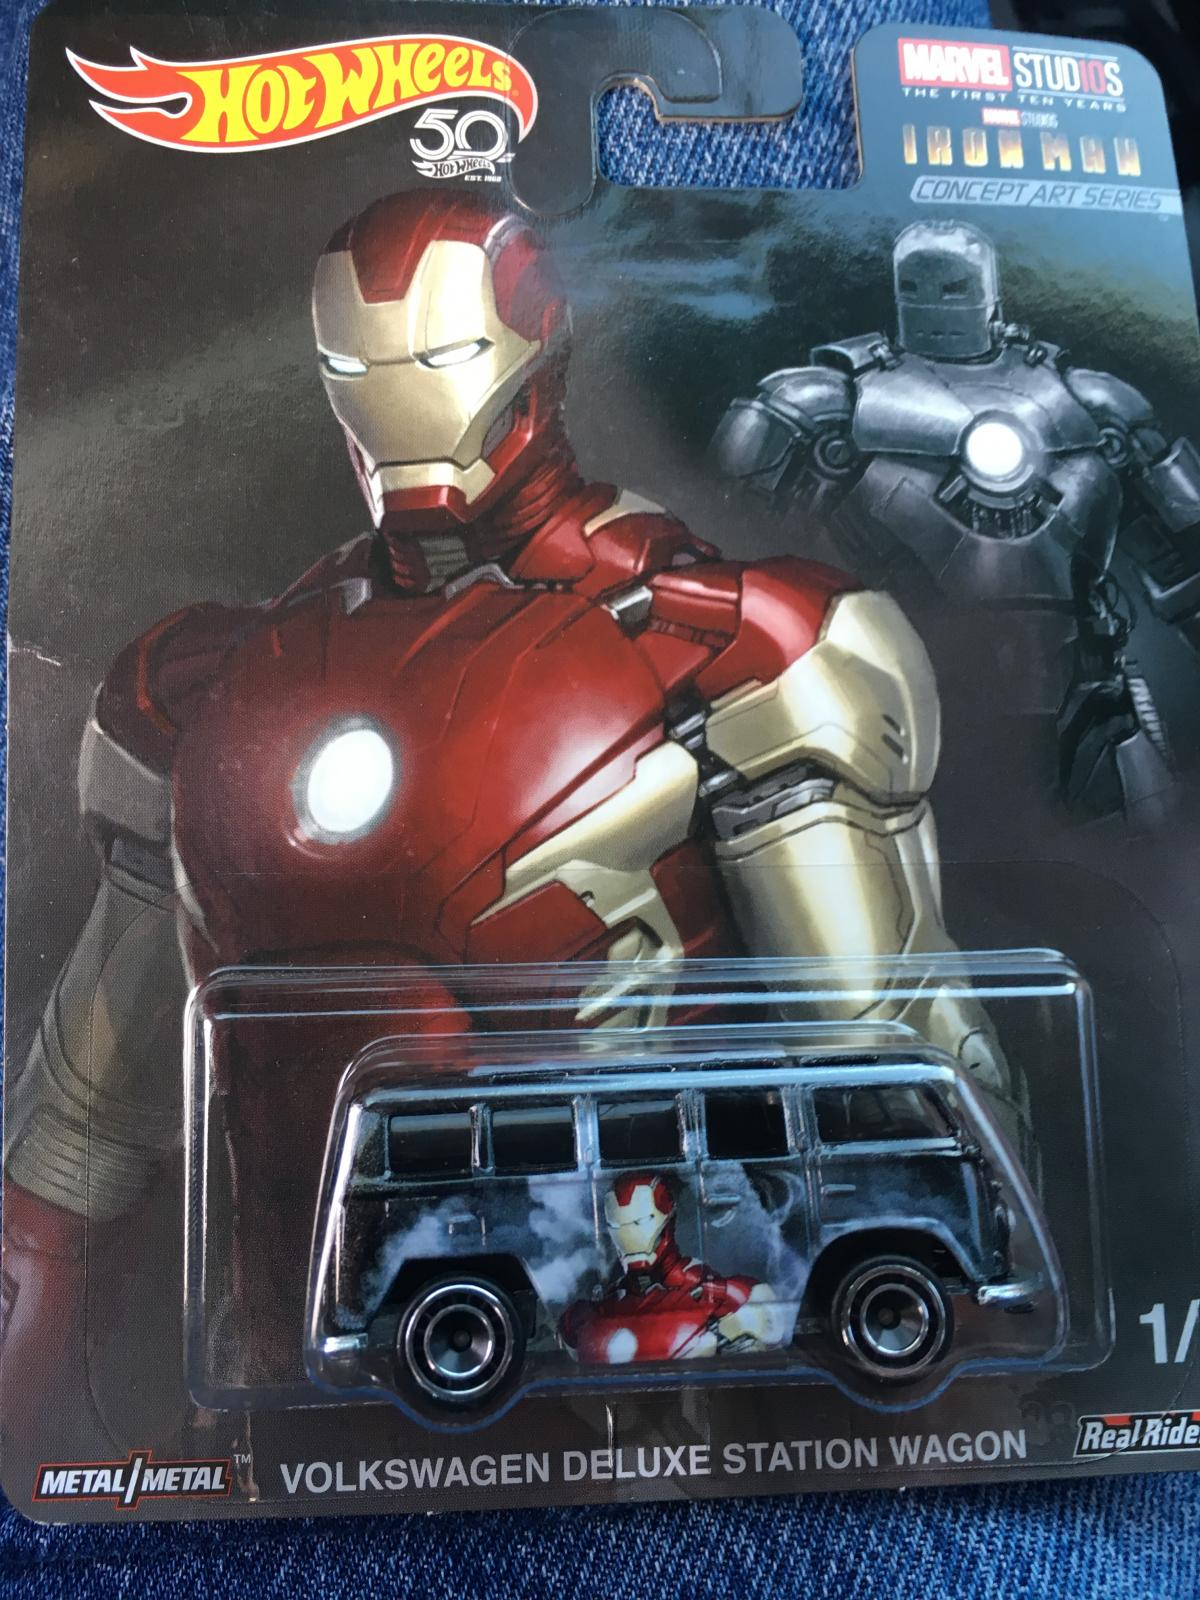 Iron man hot wheel